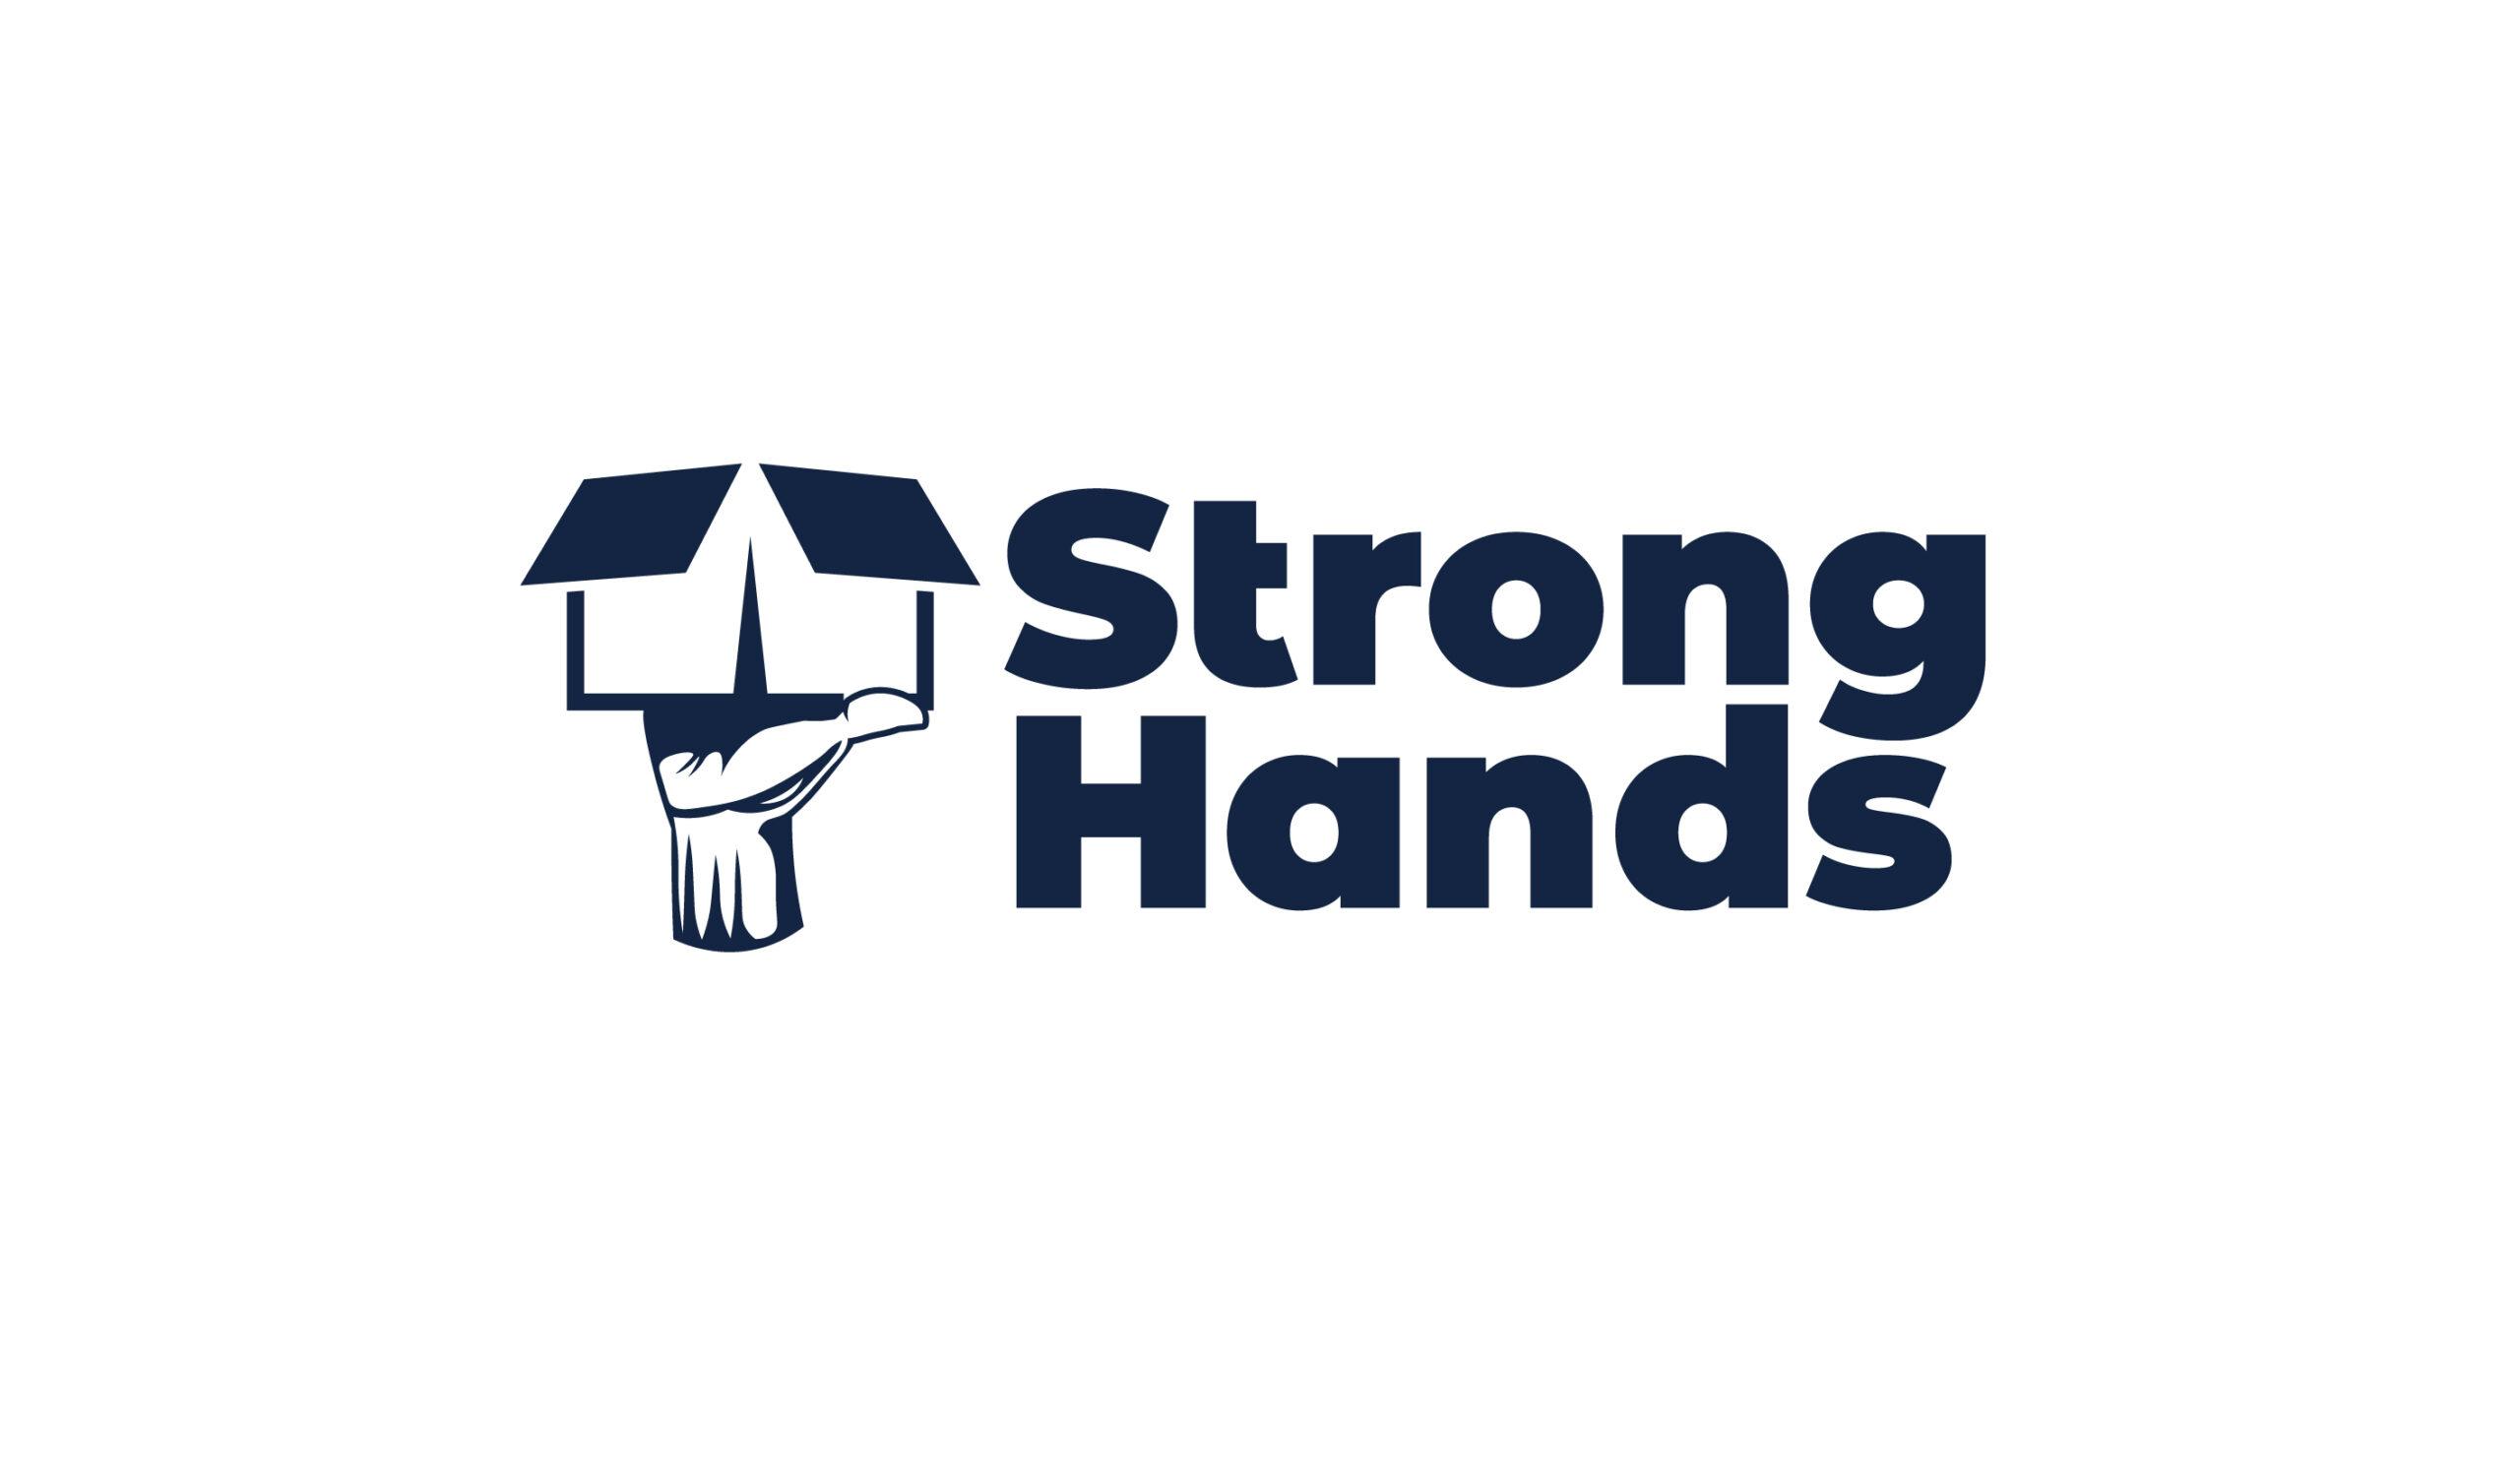 Strong hands ithaca